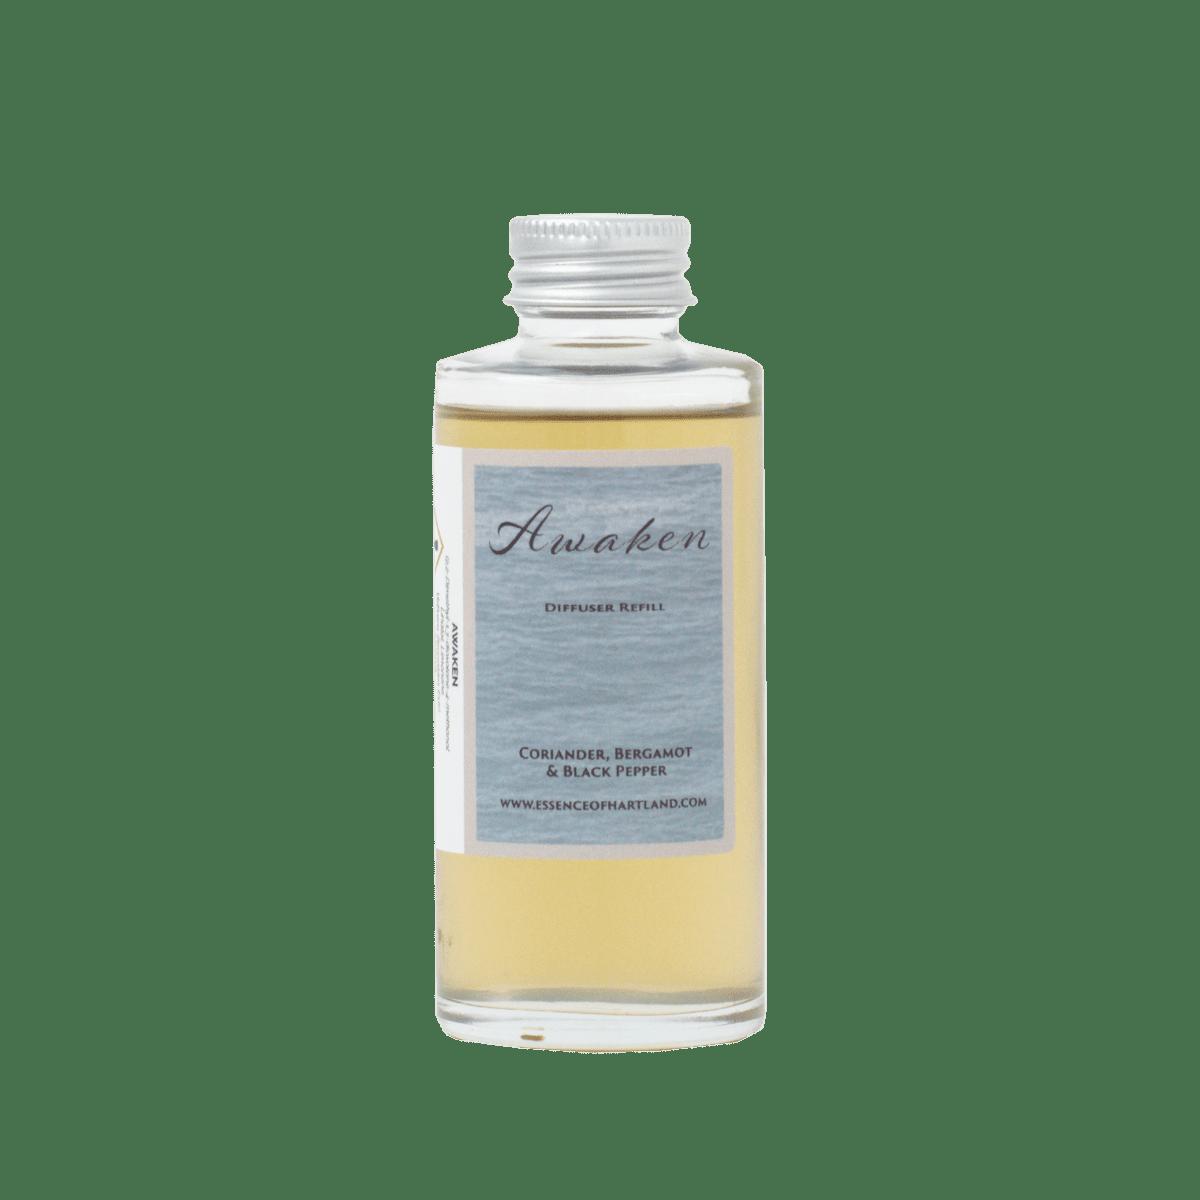 Glass diffuser refill bottle with Awaken written on the label.